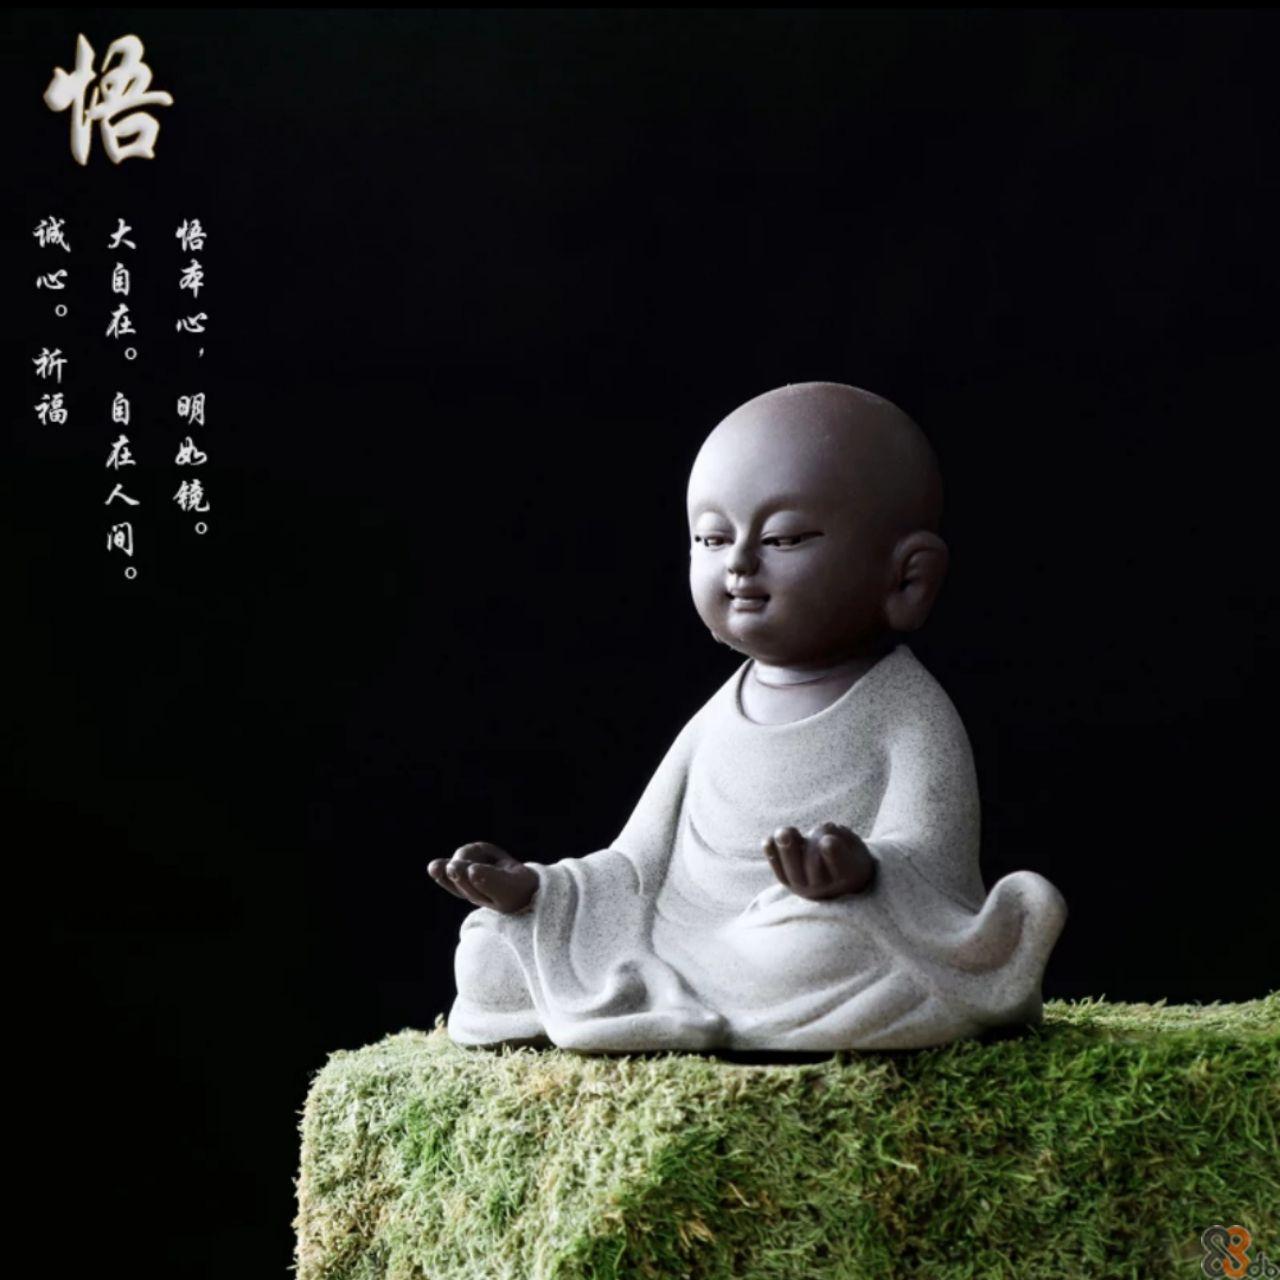 「大自在。 在人间。 O  Meditation,Statue,Sculpture,Child,